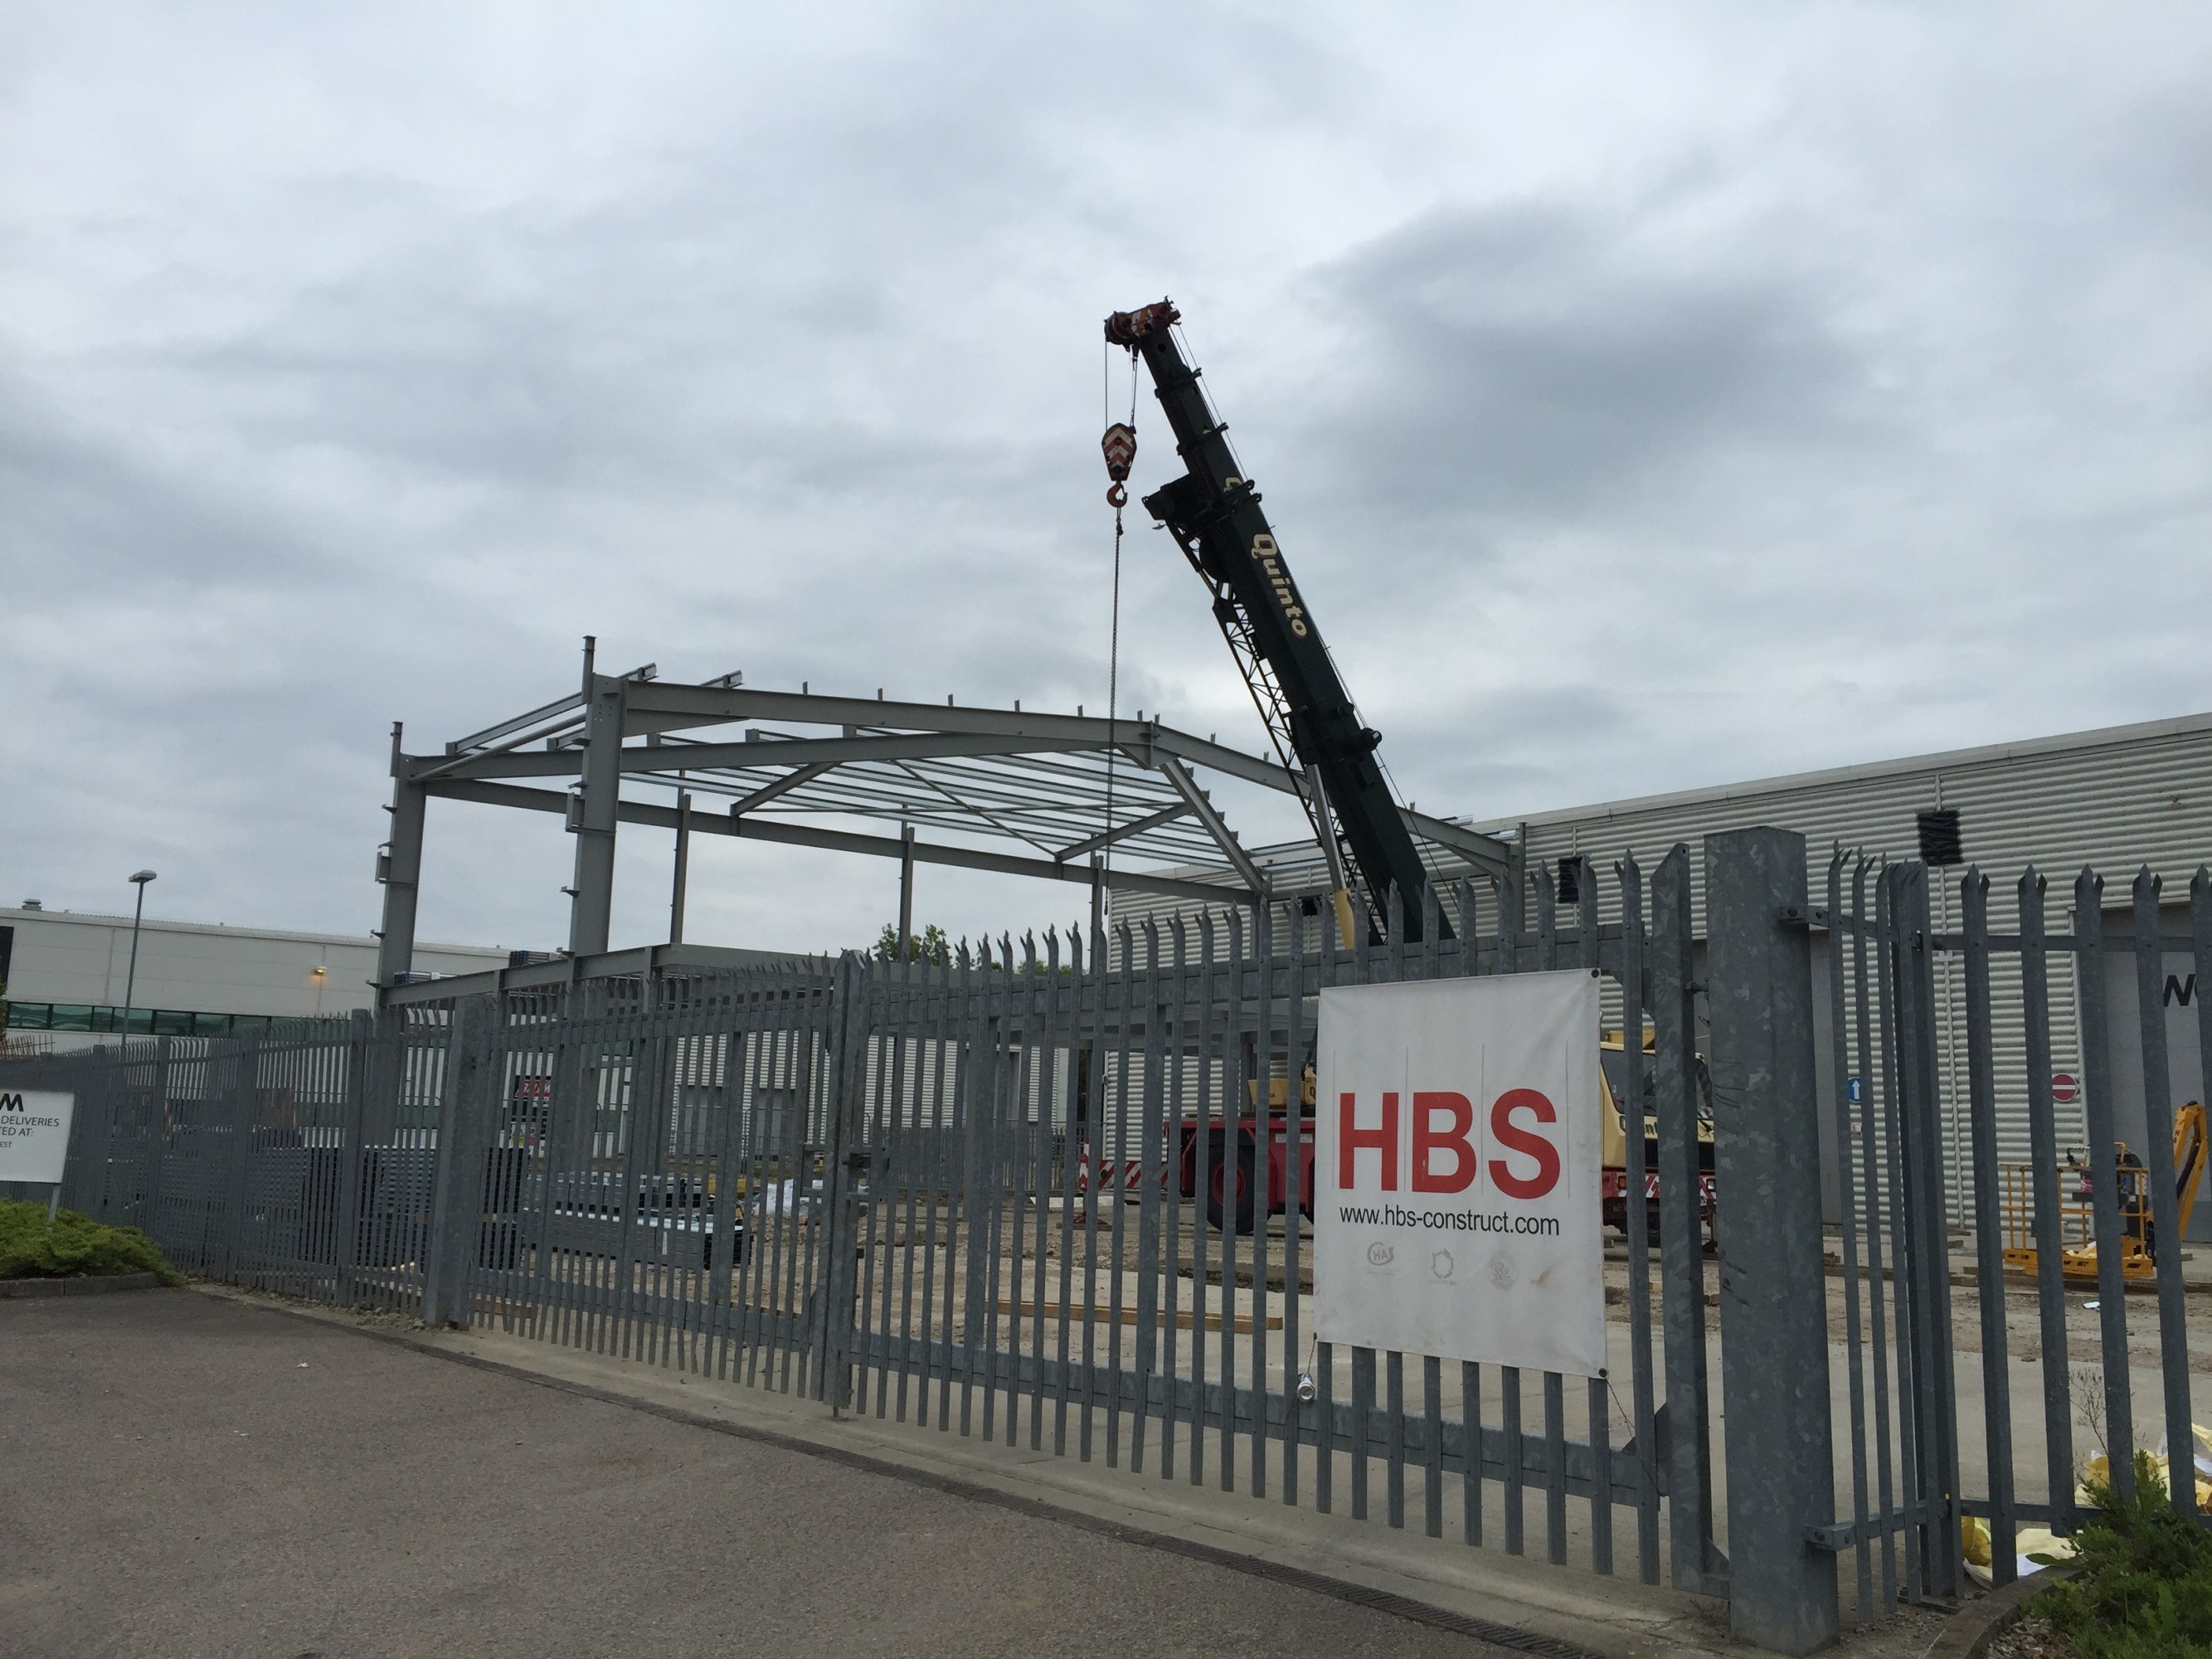 Wcm Europe Hbs Construction Ltd